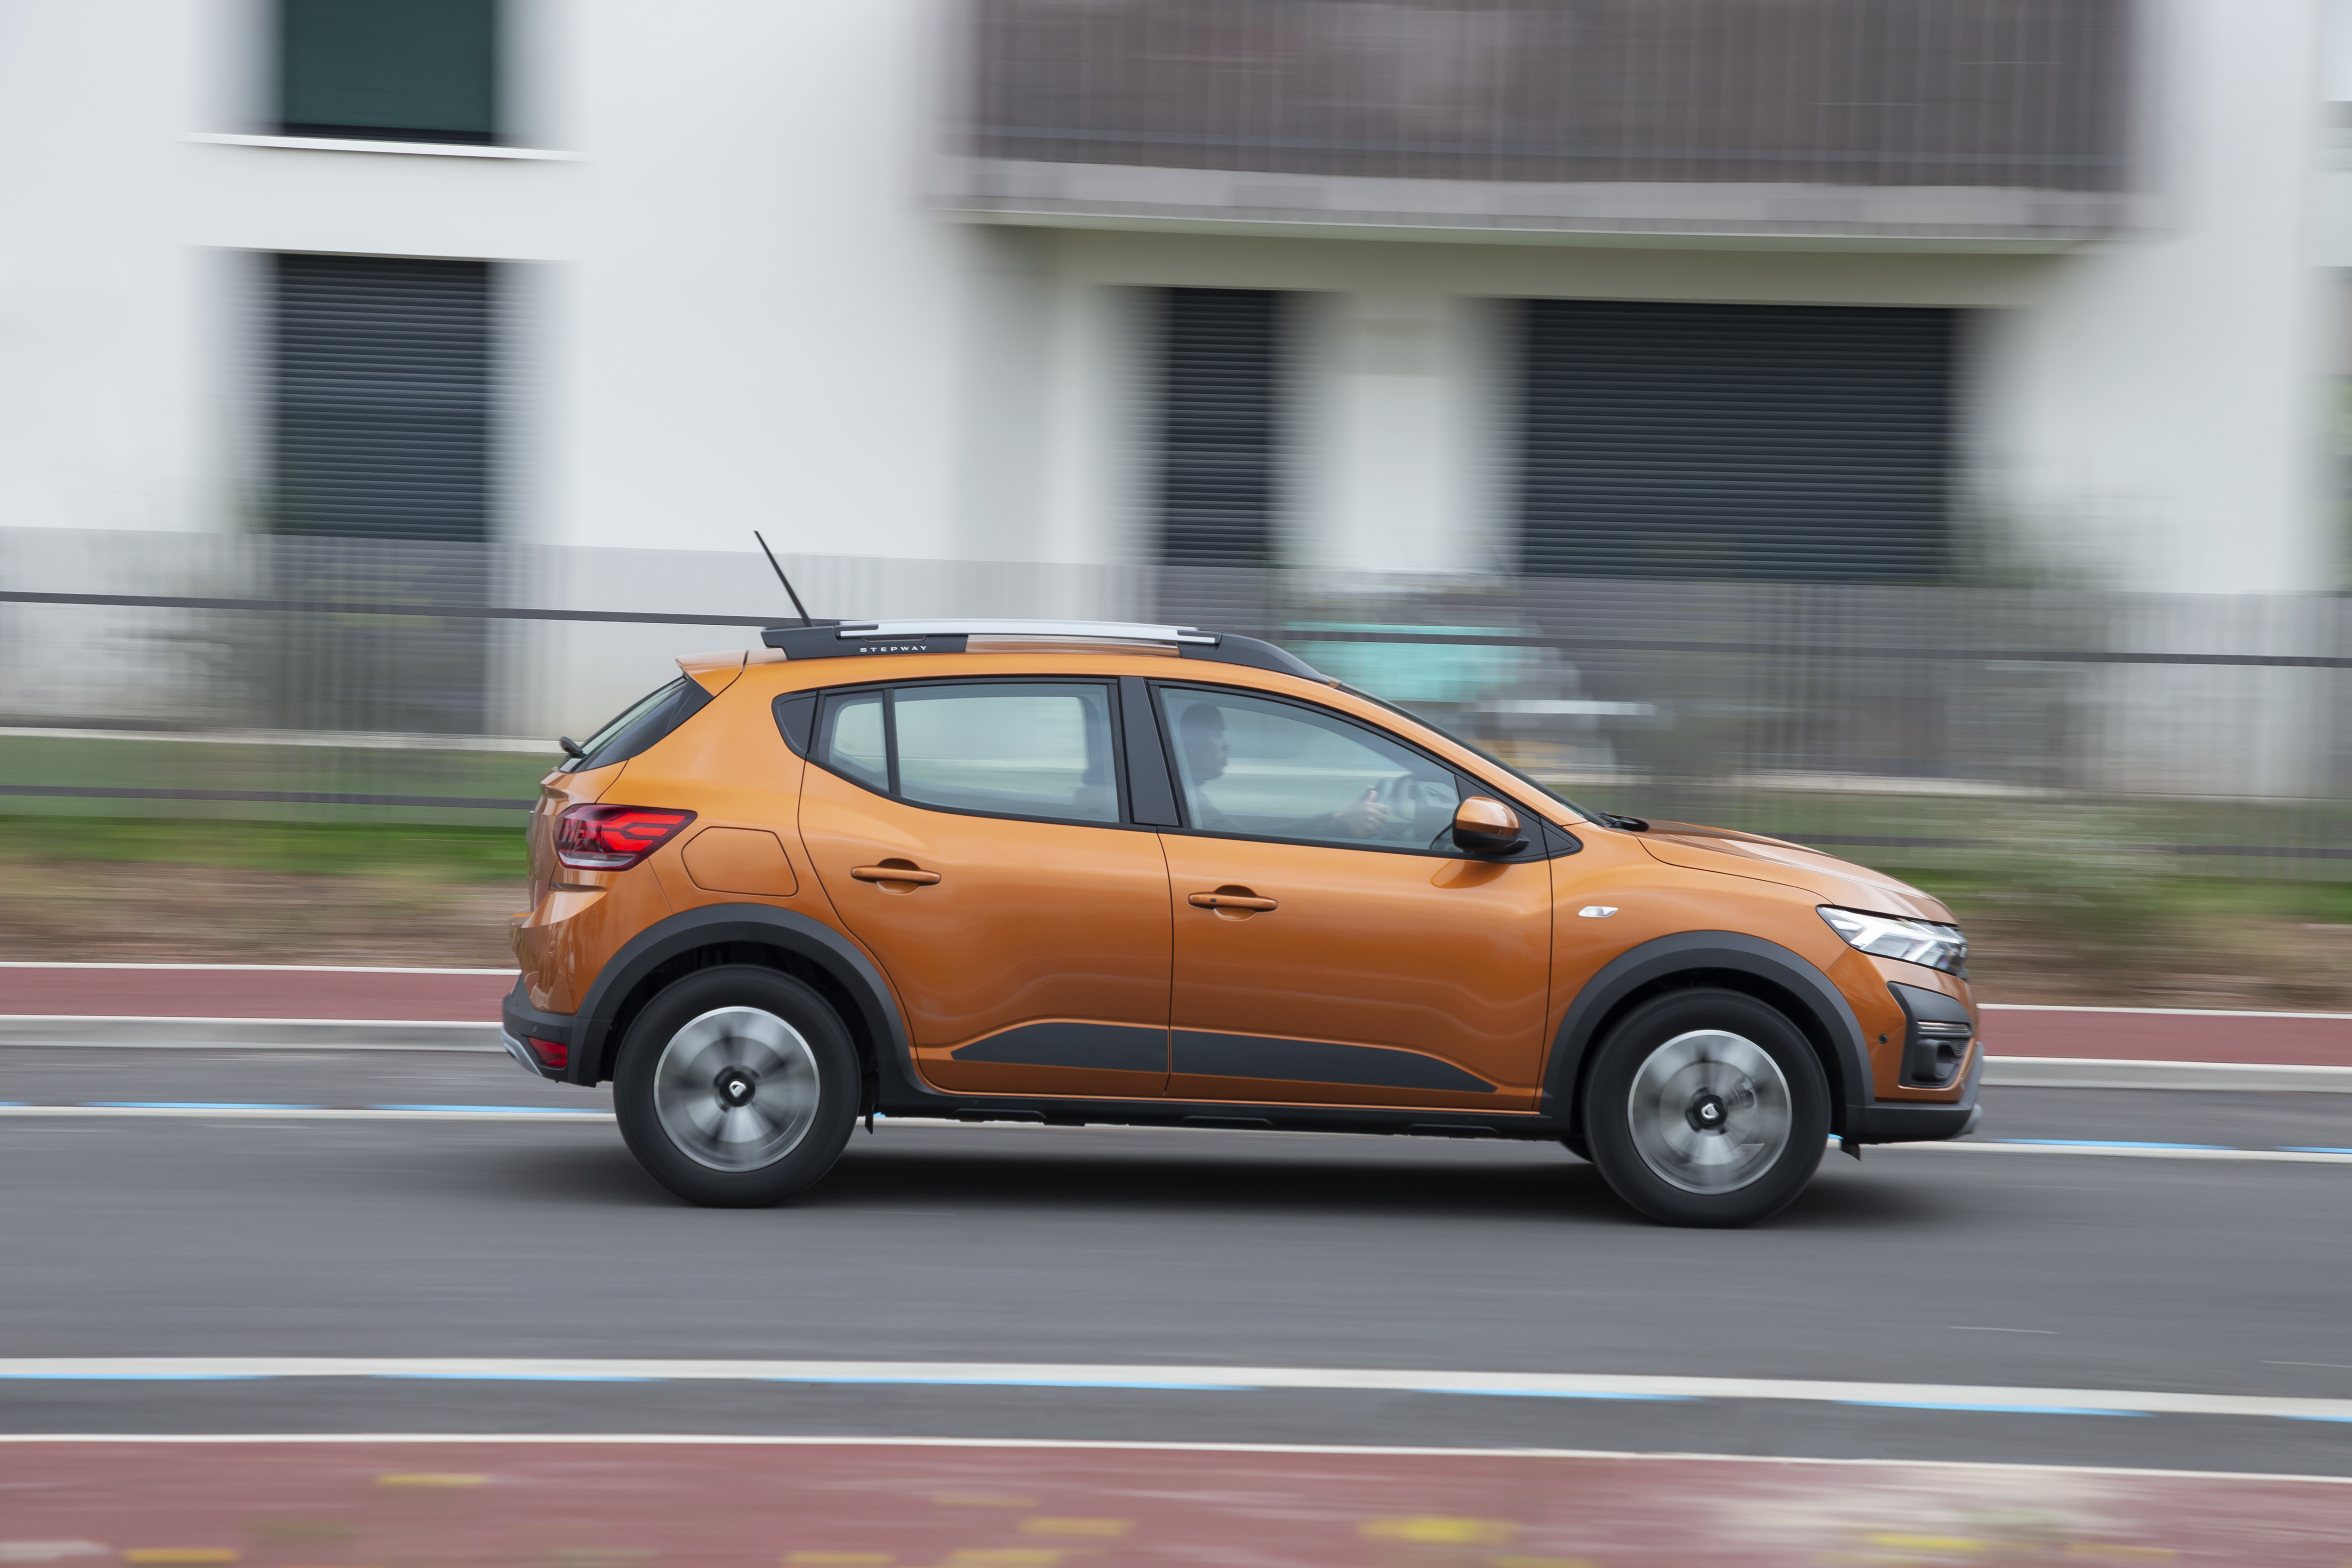 2020 - Essais presse Nouvelle Dacia SANDERO STEPWAY (2)